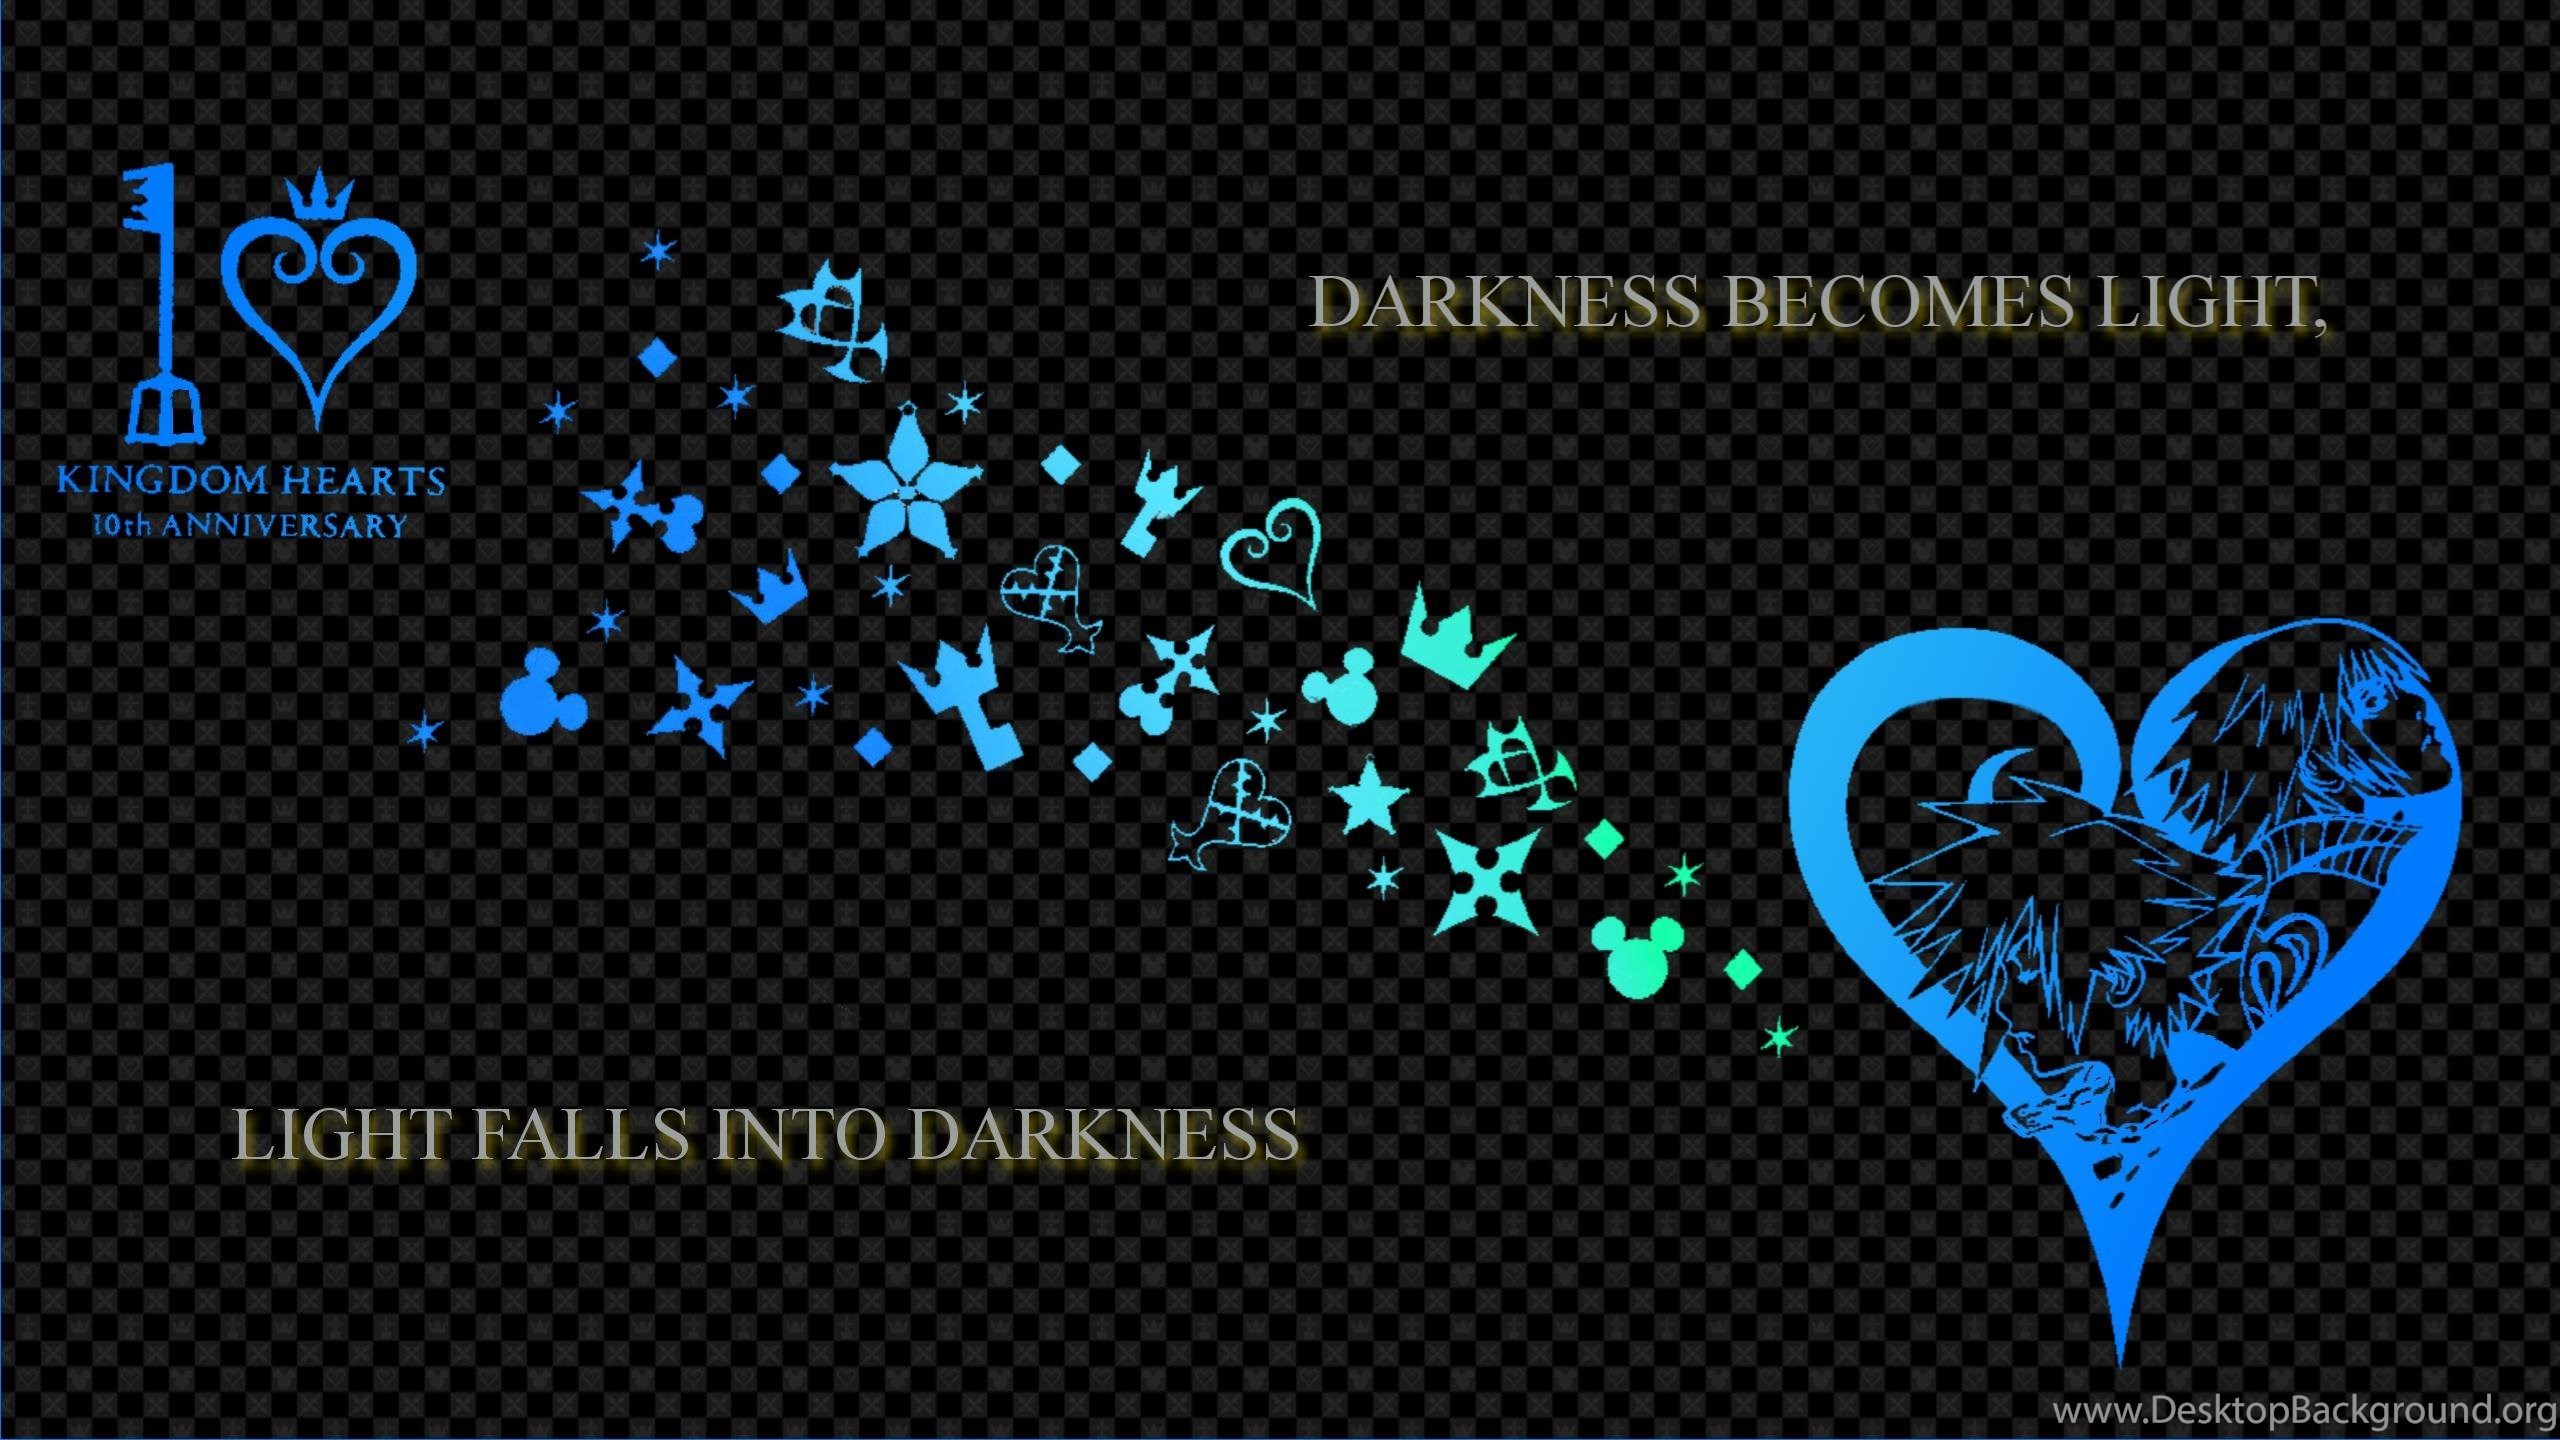 Kingdom Hearts 3 Wallpapers Wallpapers Cave Desktop Background